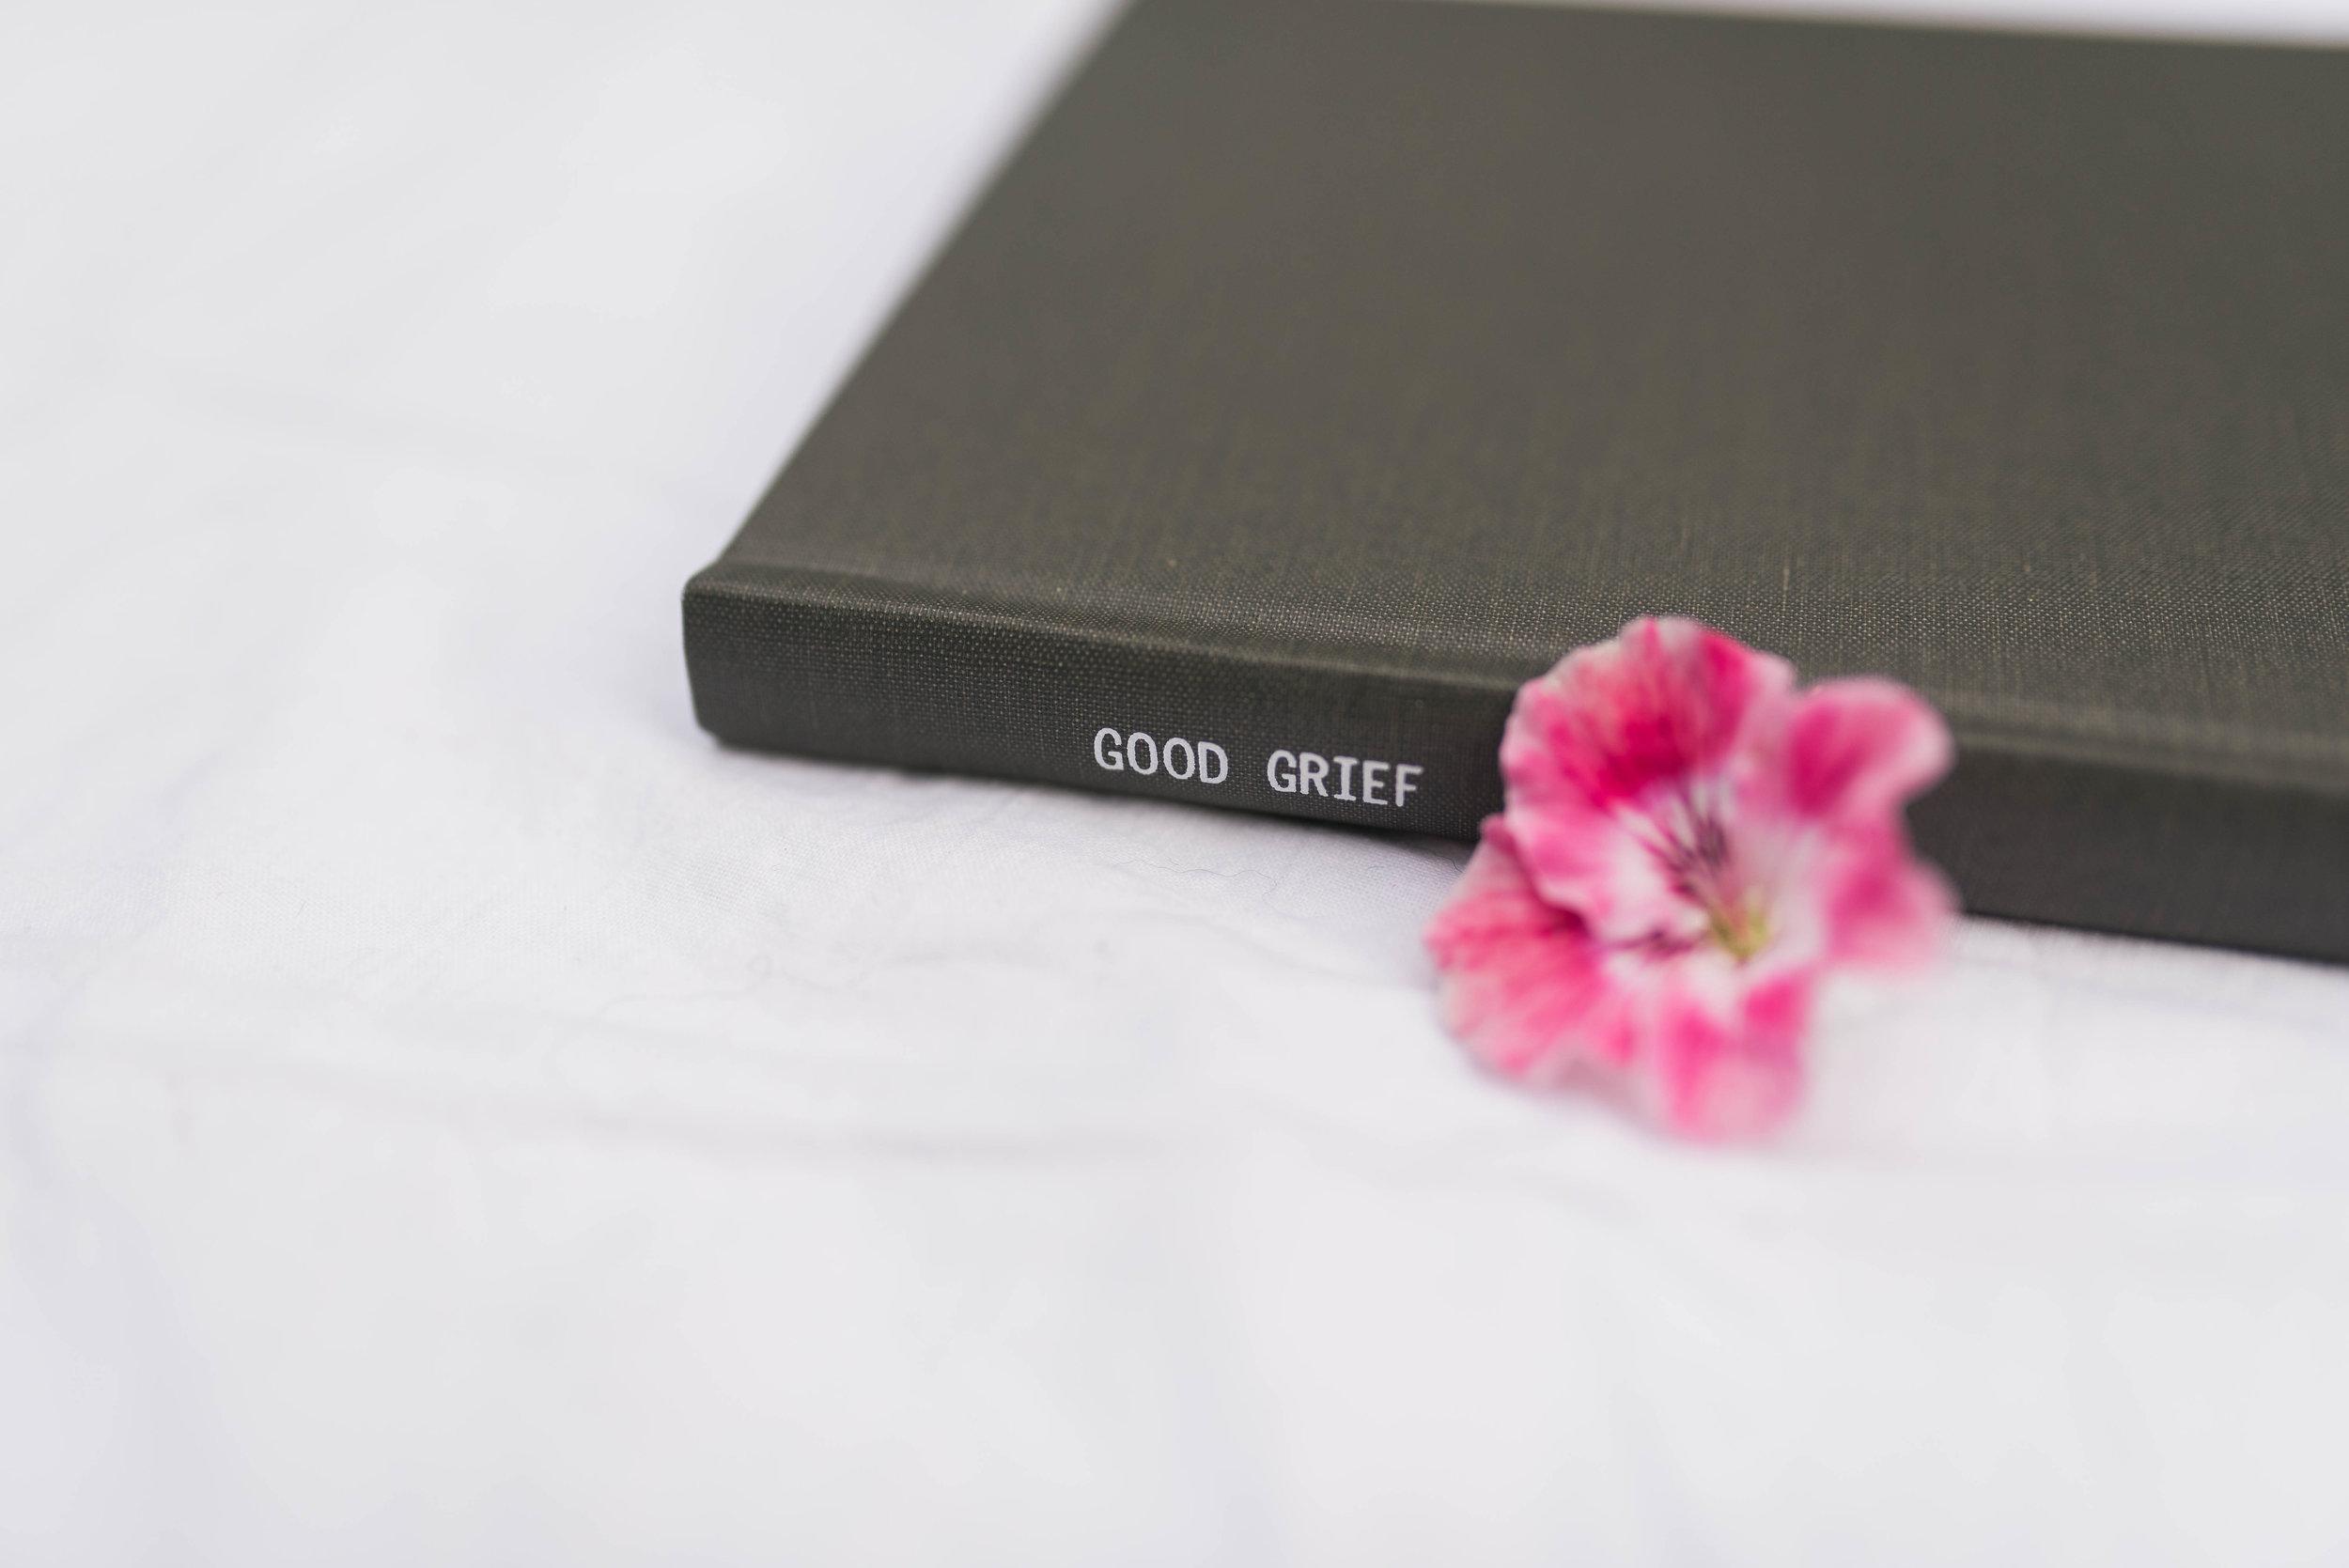 GOOD-GRIEF-sadiebanksphotography-15.jpg